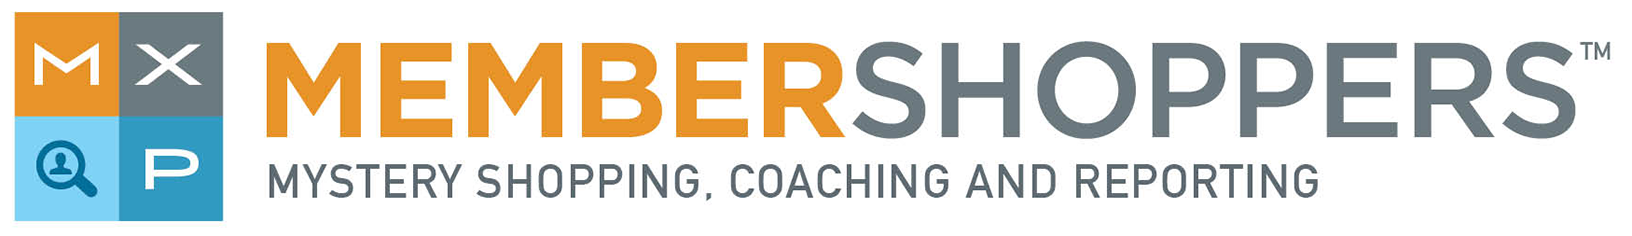 MemberShoppers mystery shopping logo